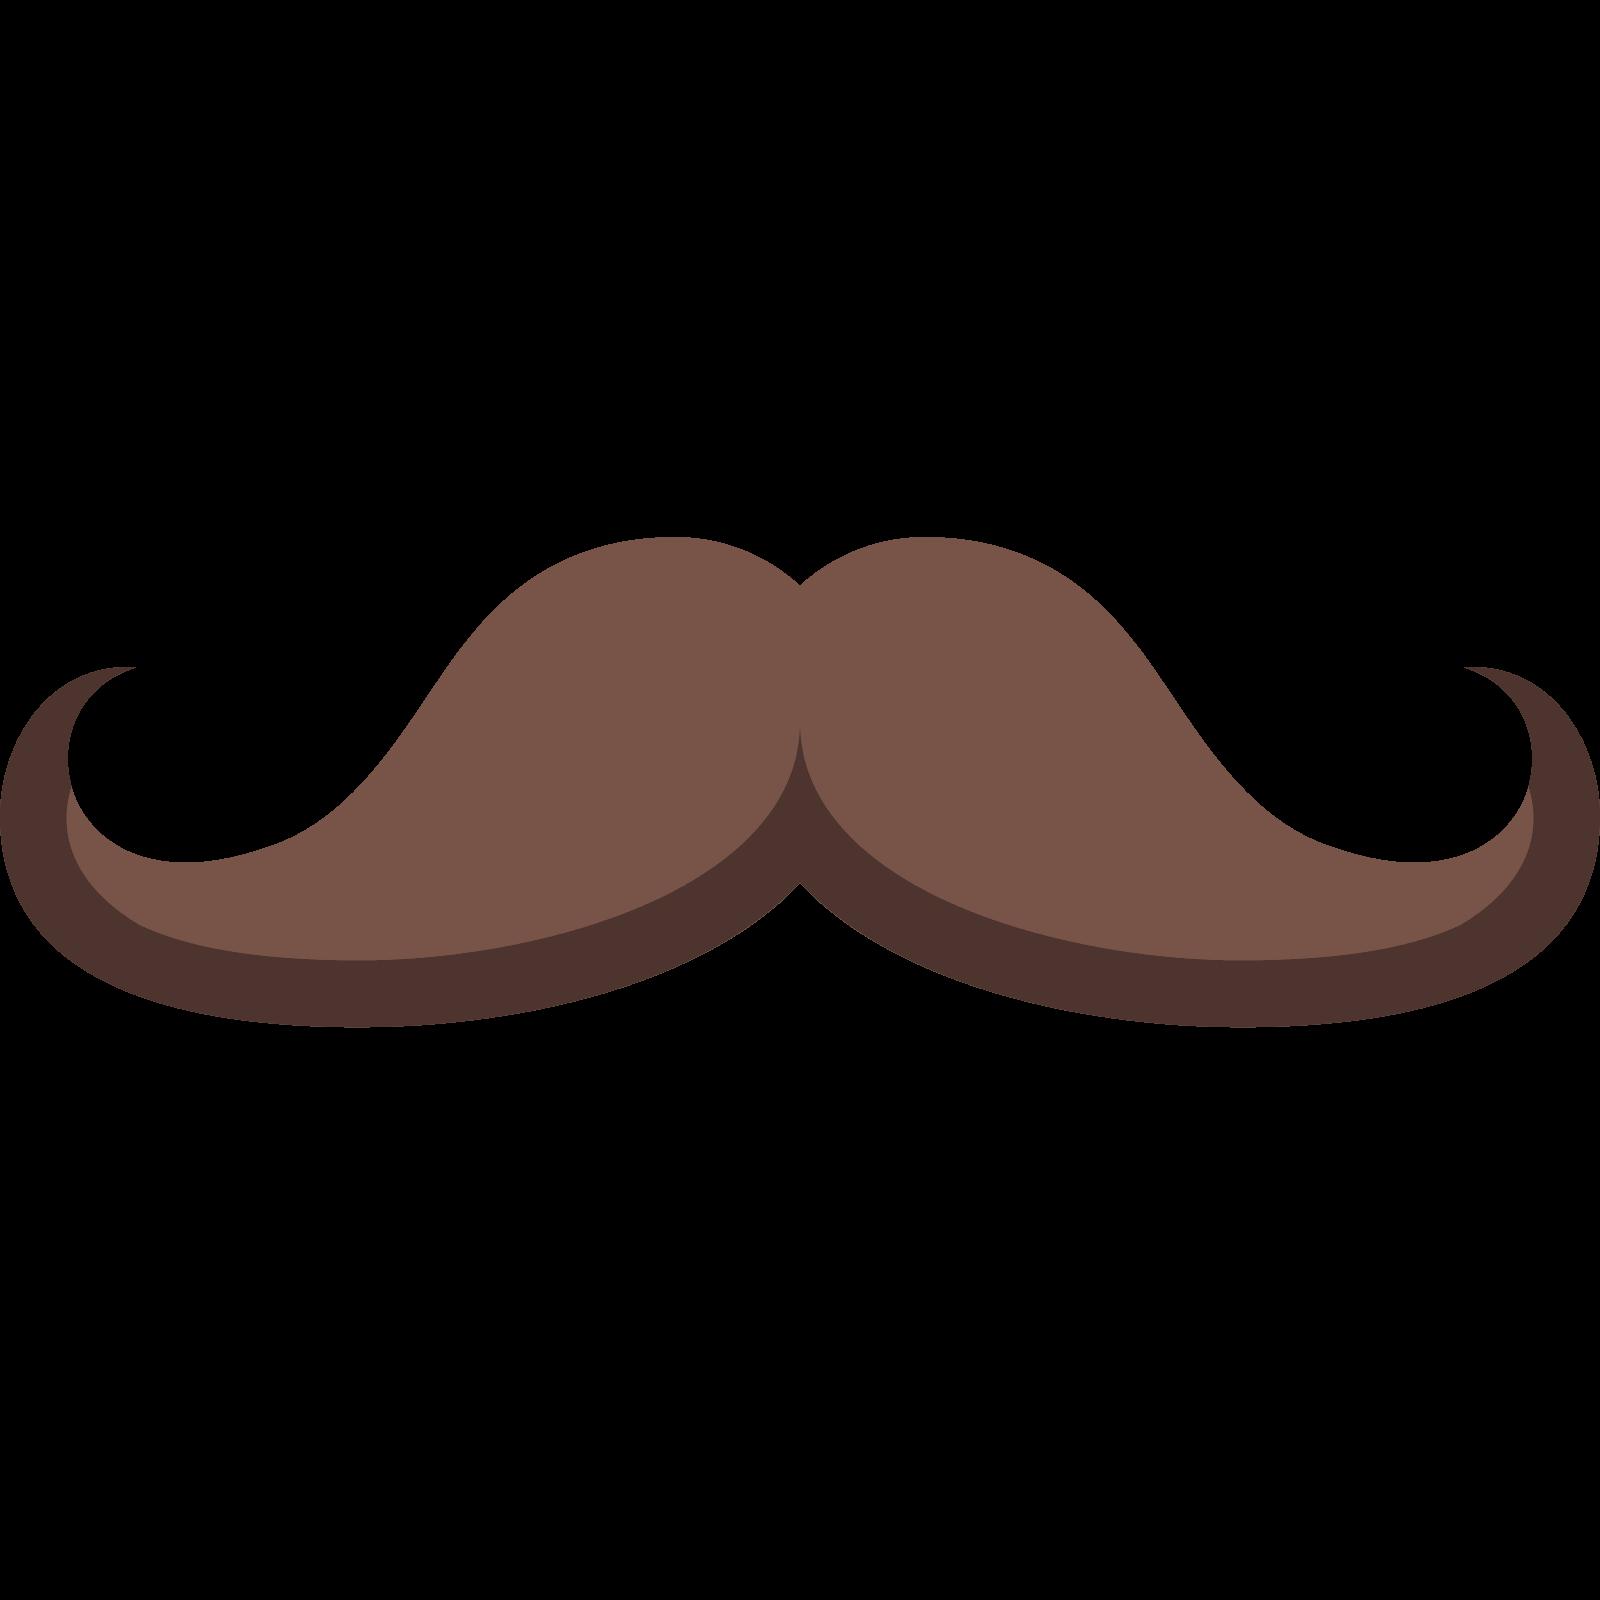 Bigote ingl s png. Clipart mustache colored